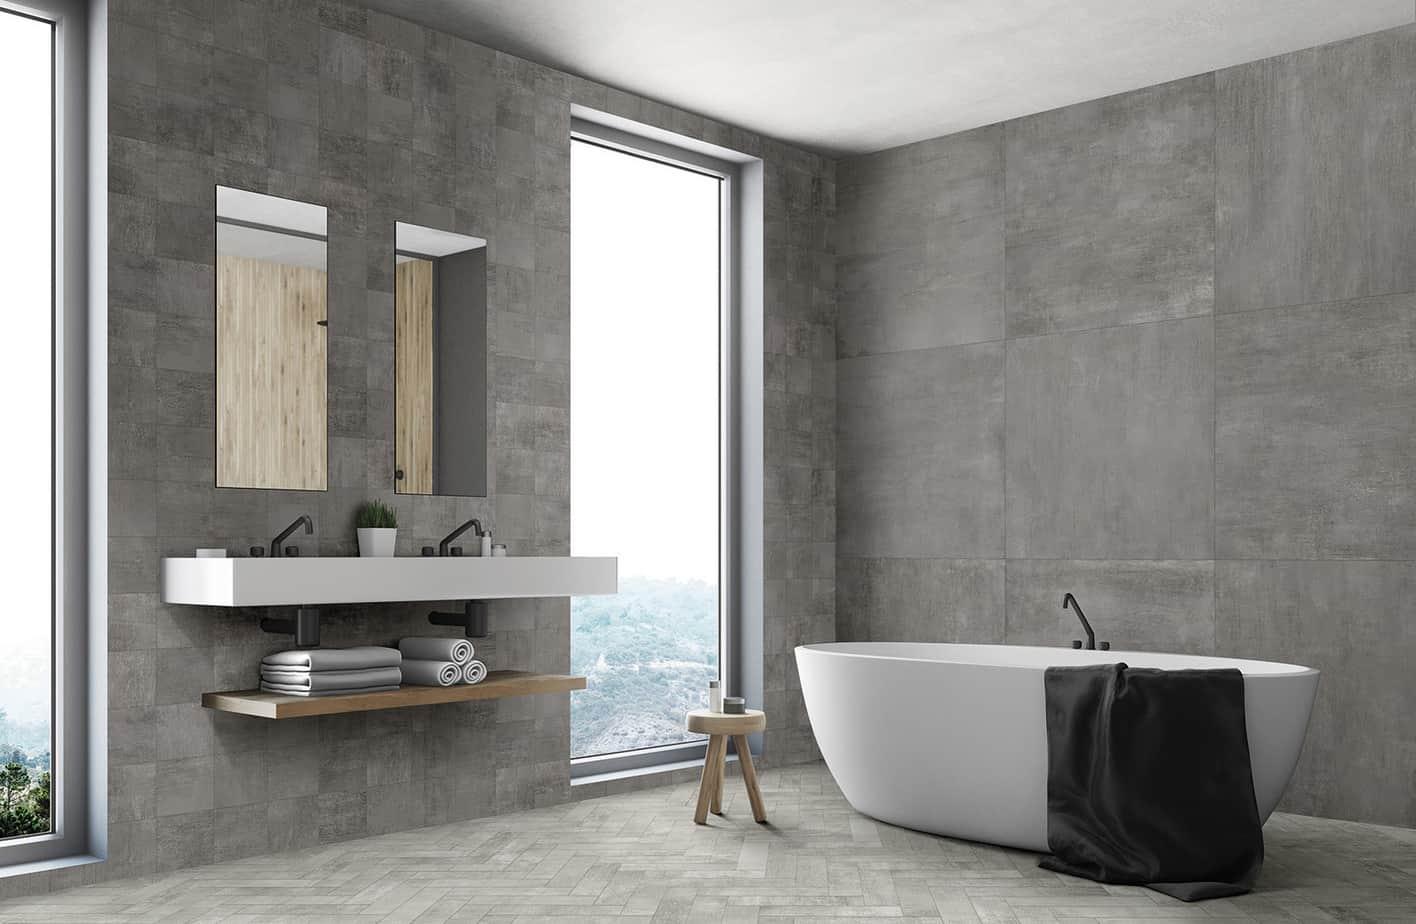 bathroom trends 2021 open-space interior